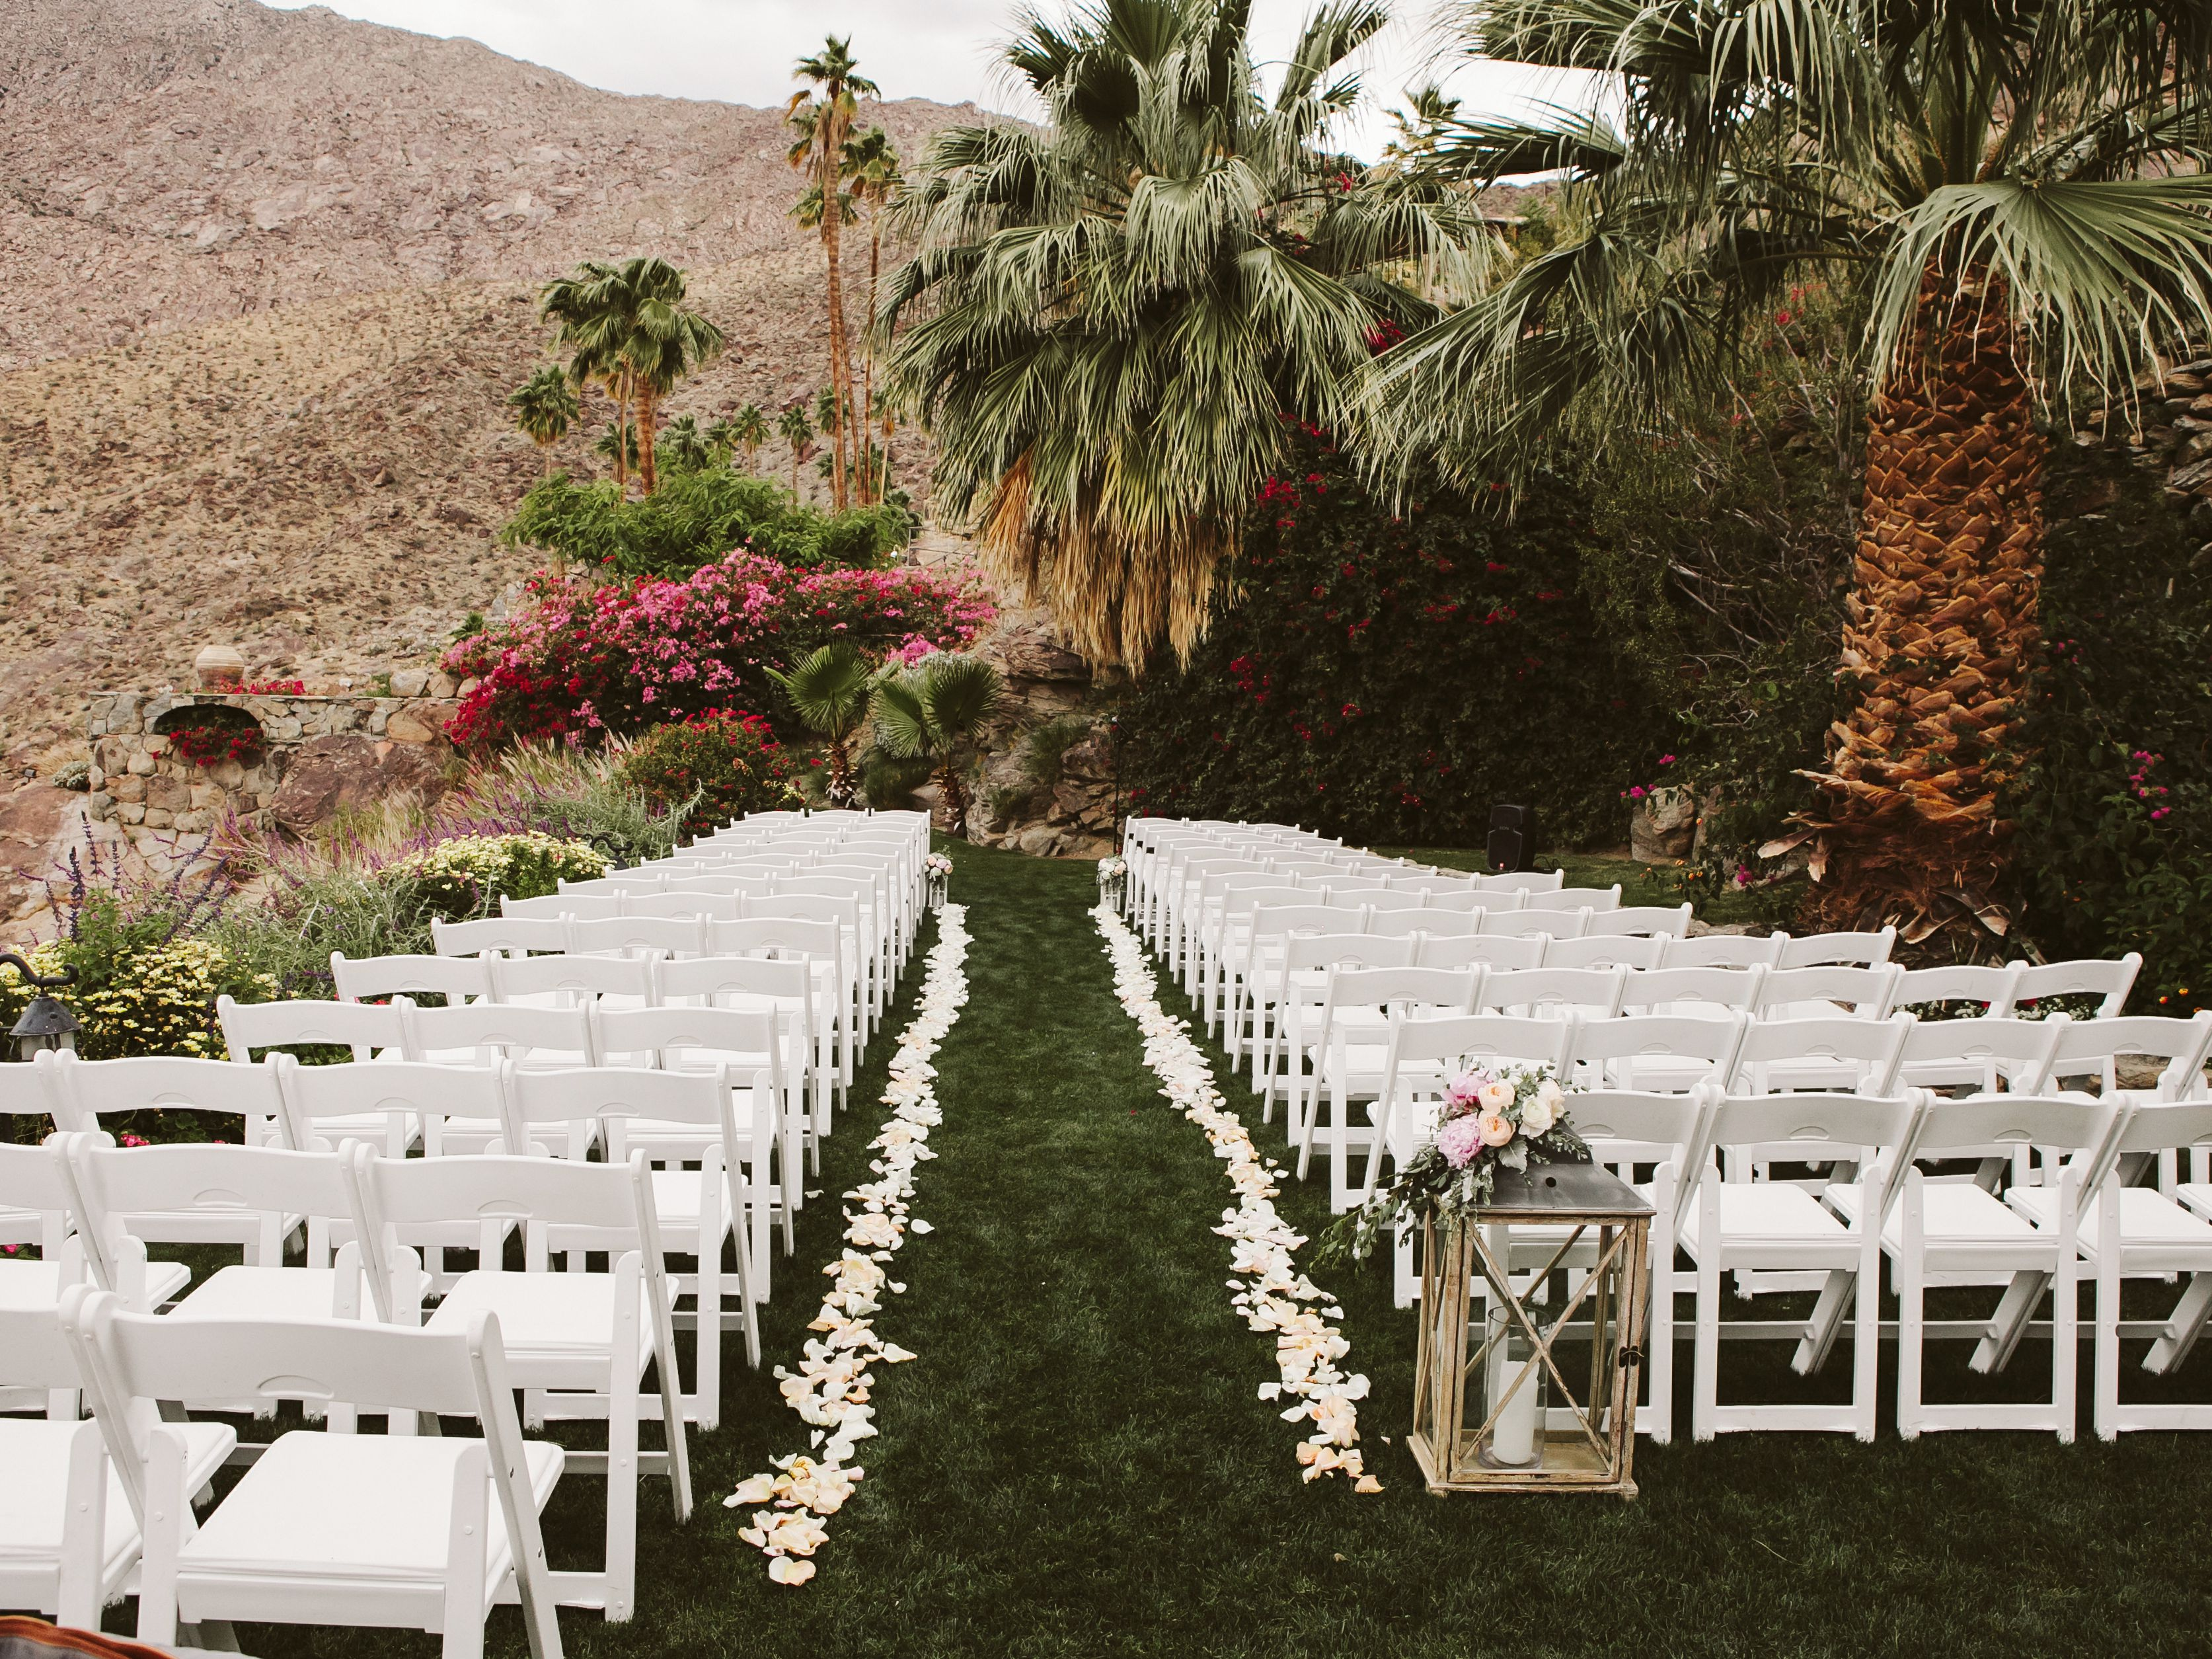 Wedding Ceremony Venues Green Bay Wi - Marriage Improvement